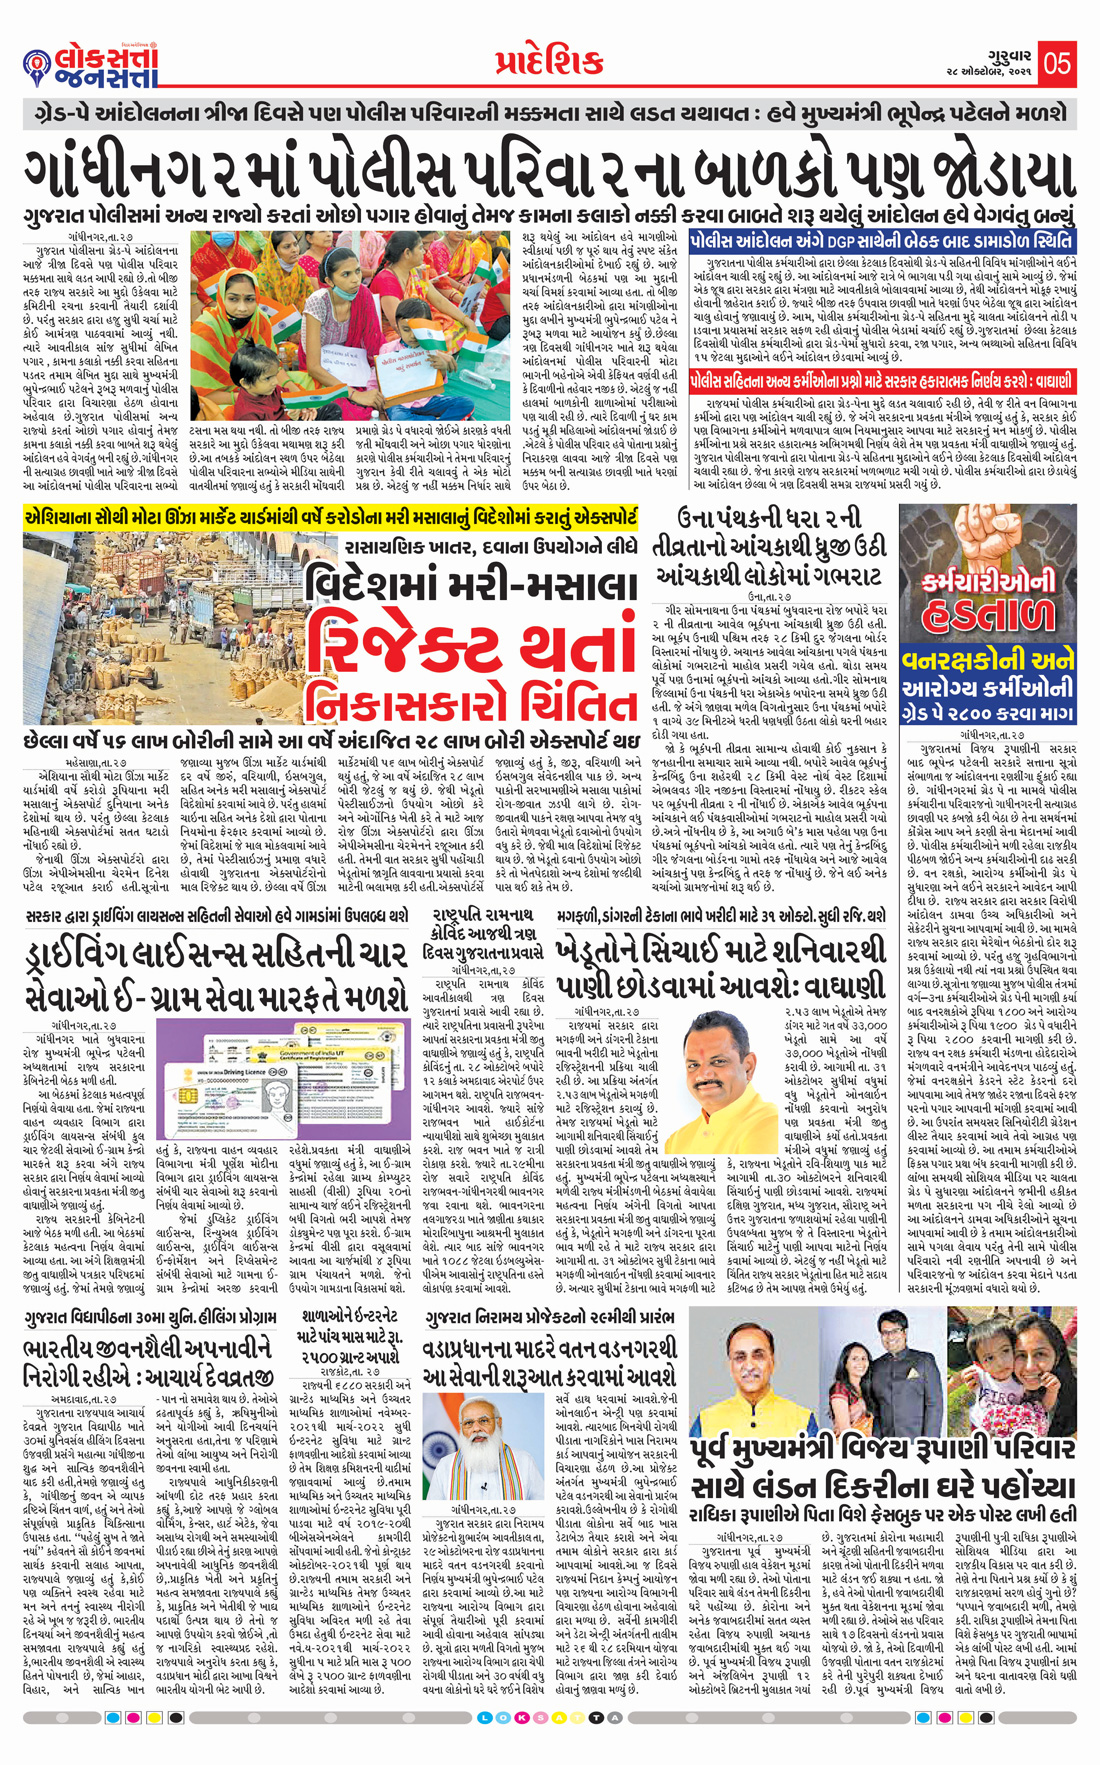 Loksatta Jansatta News Papaer E-paper dated 2021-10-28   Page 5